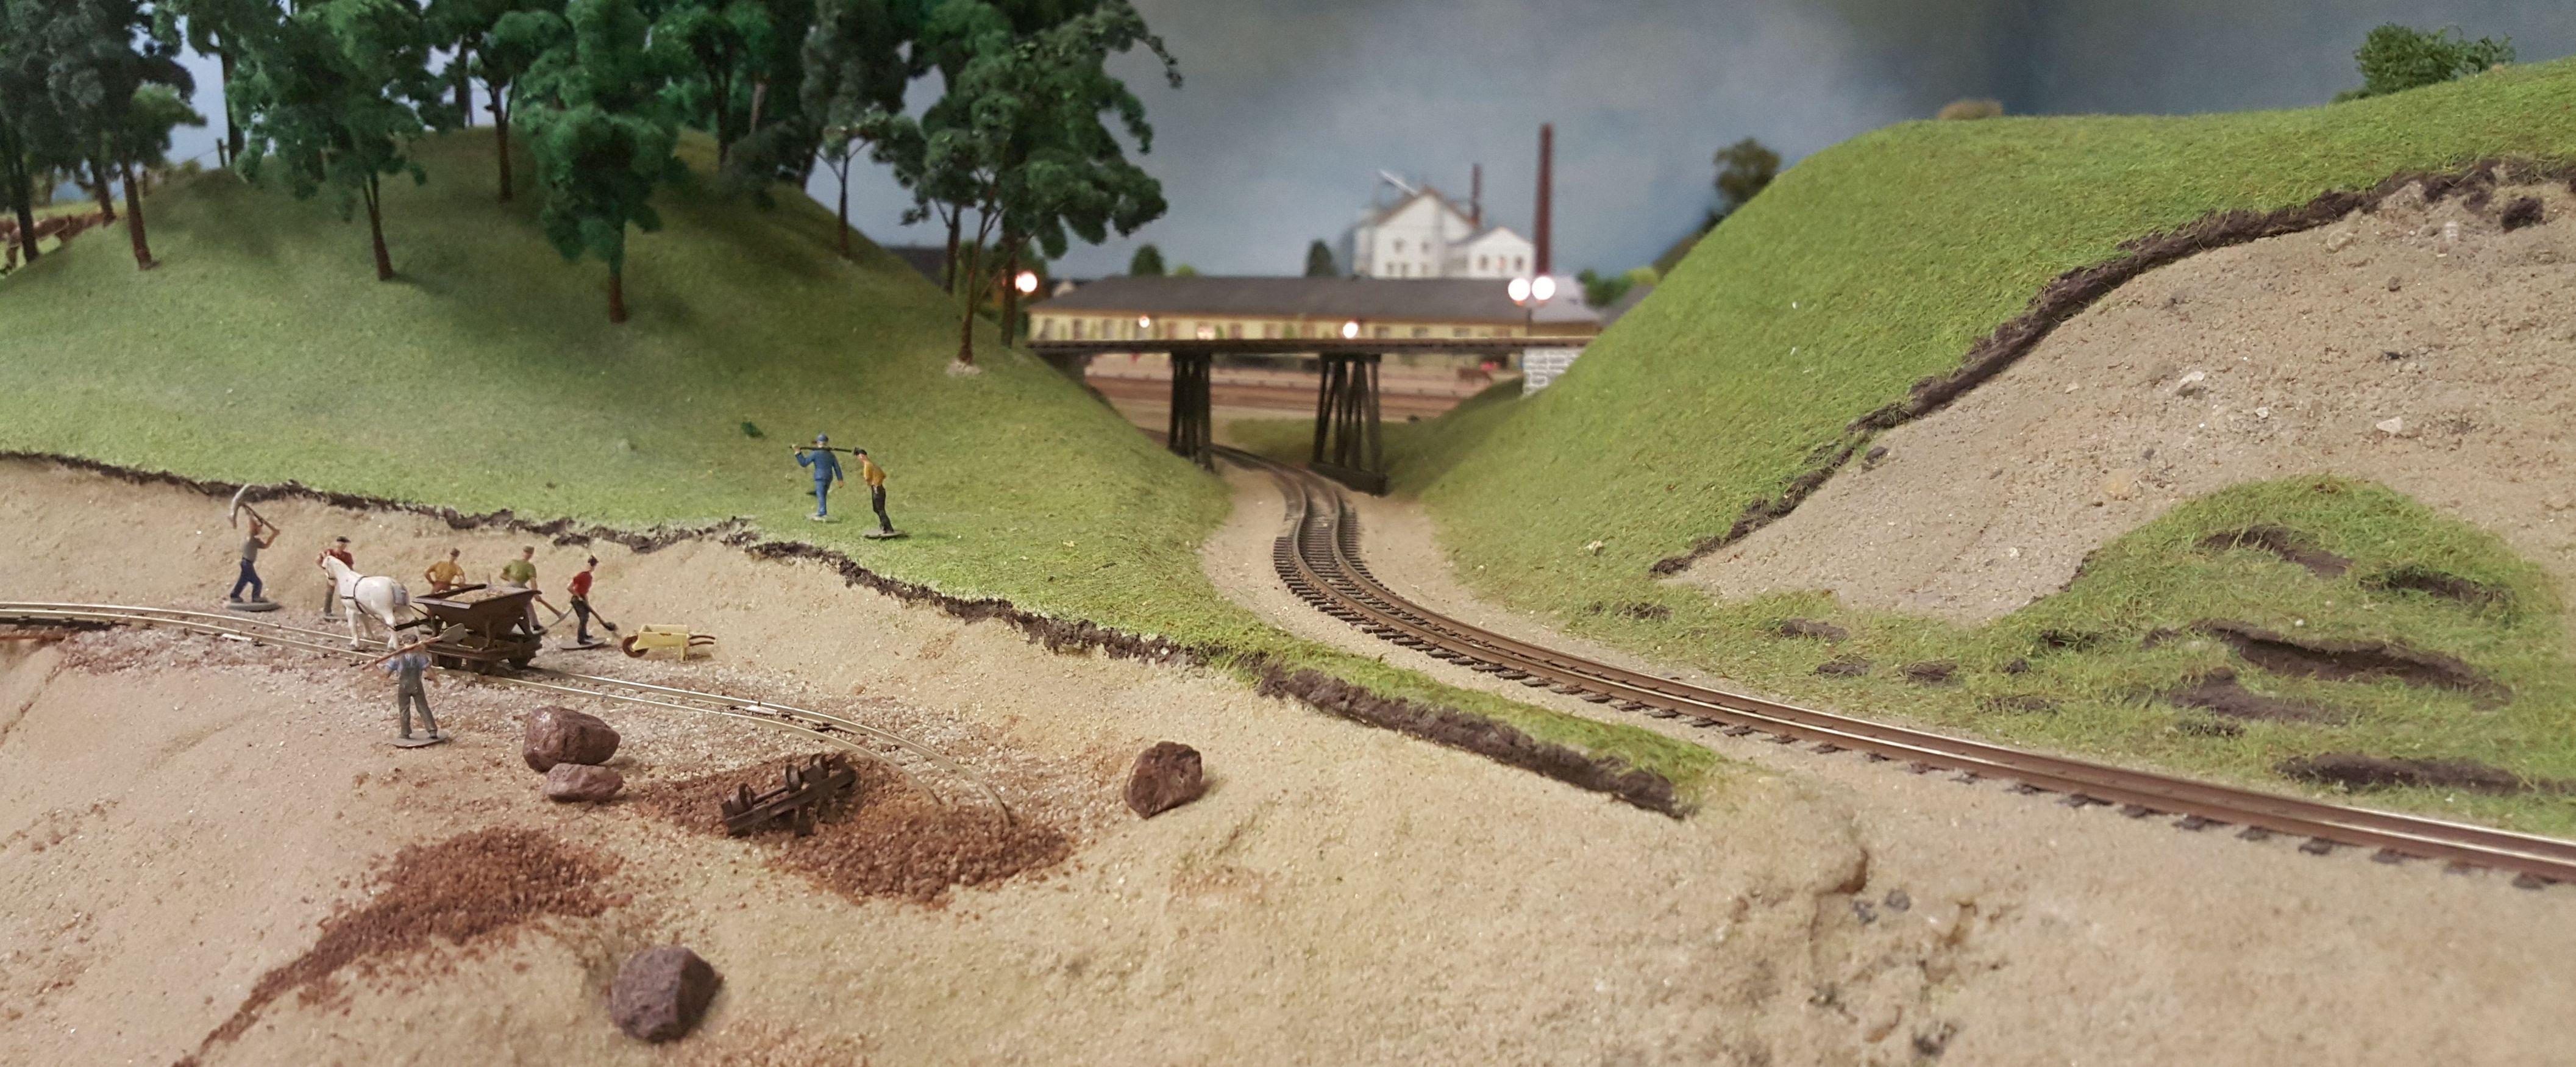 Hedegaardens Privatbane - Smalspor i grusgraven